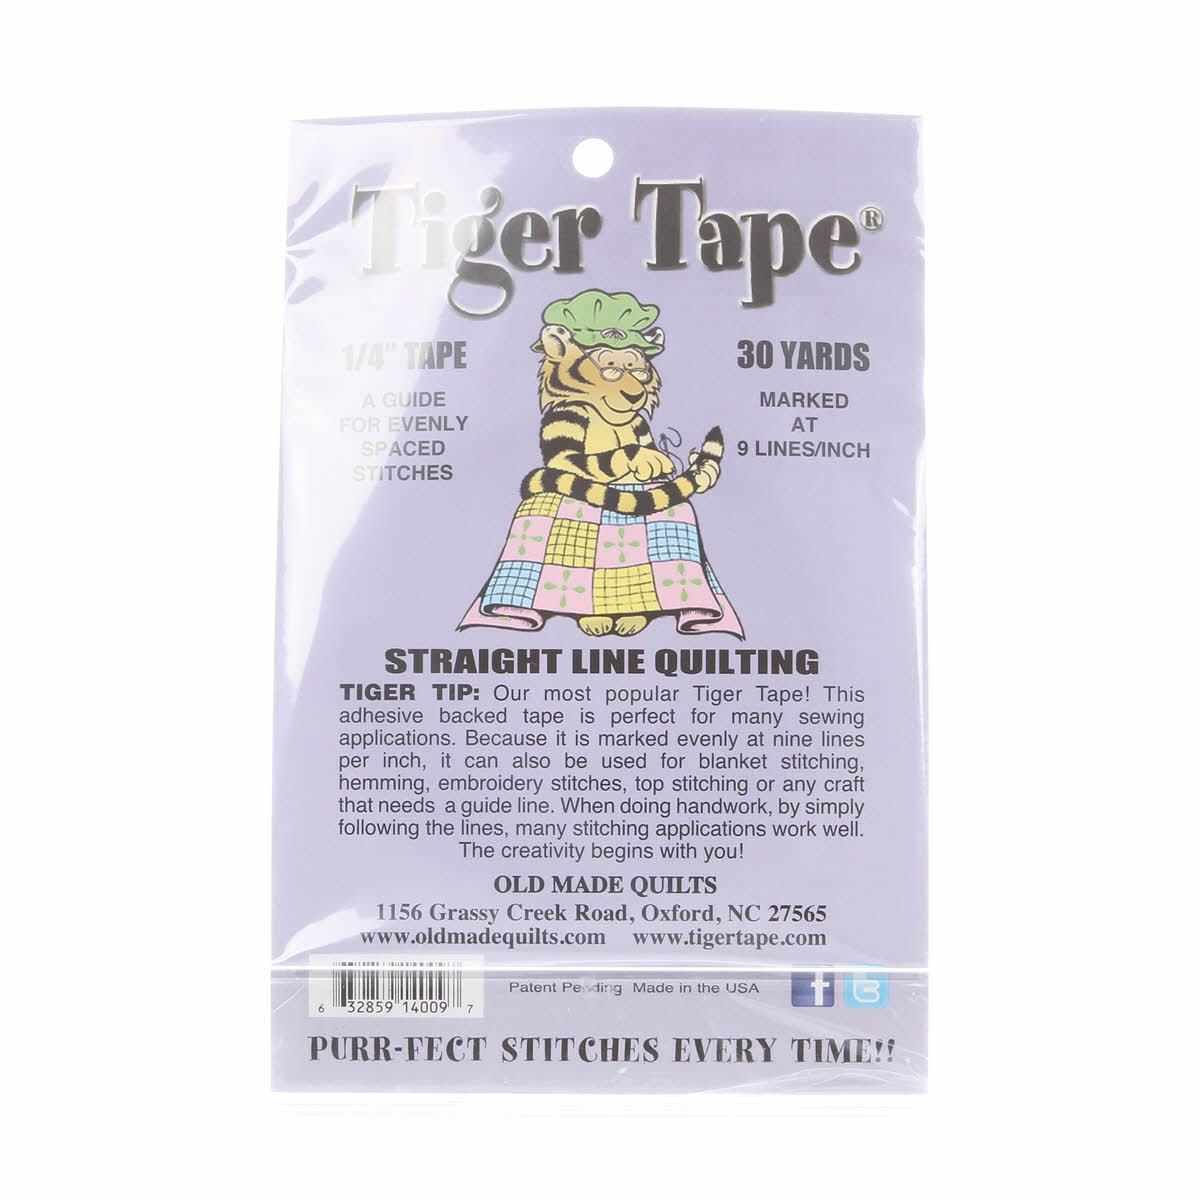 Tiger Tape 9 Marks Per Inch - 1/4 inch wide